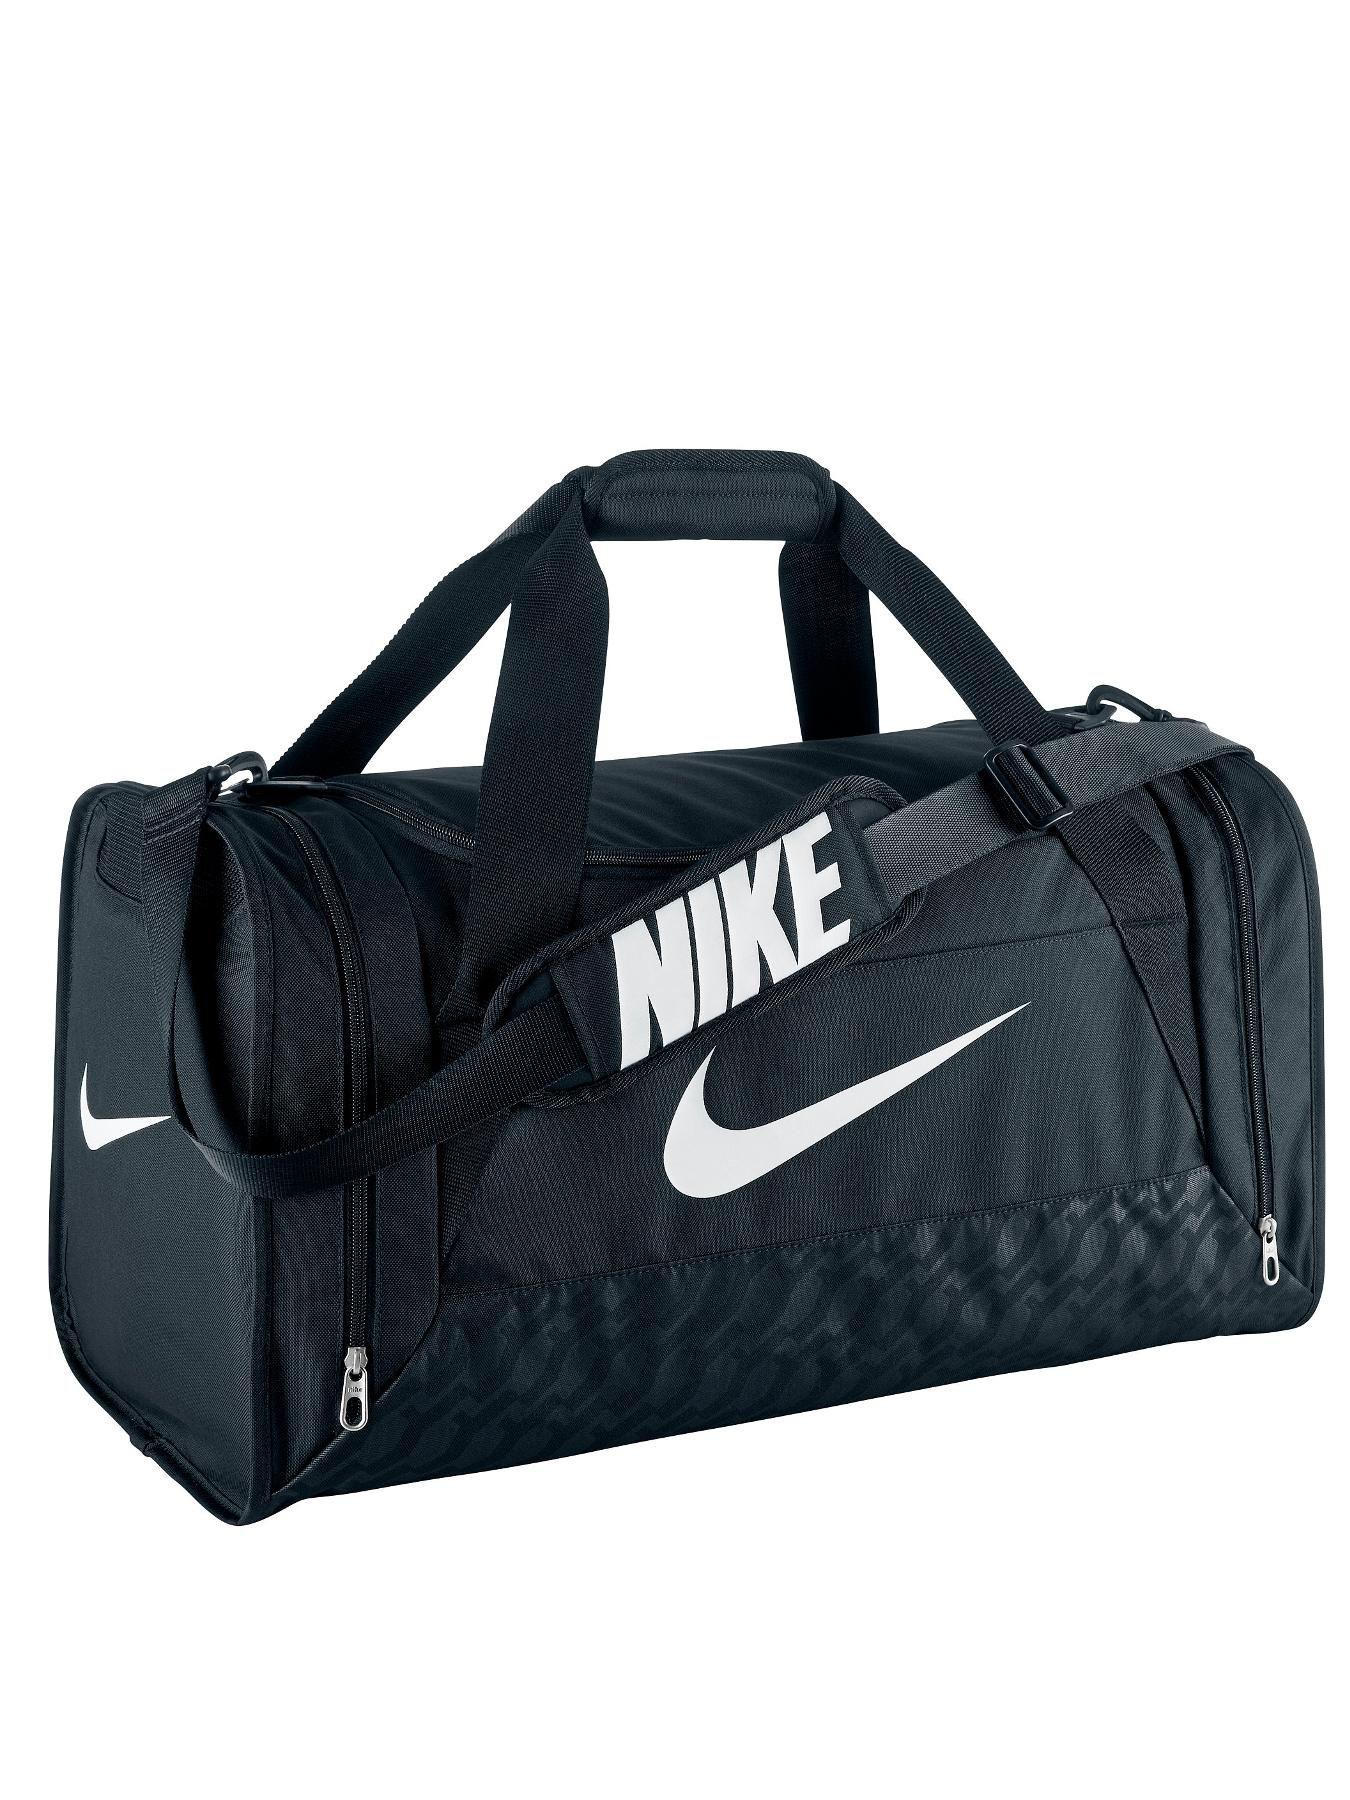 7730255449bd Nike Brasilia Duffle Bag Medium